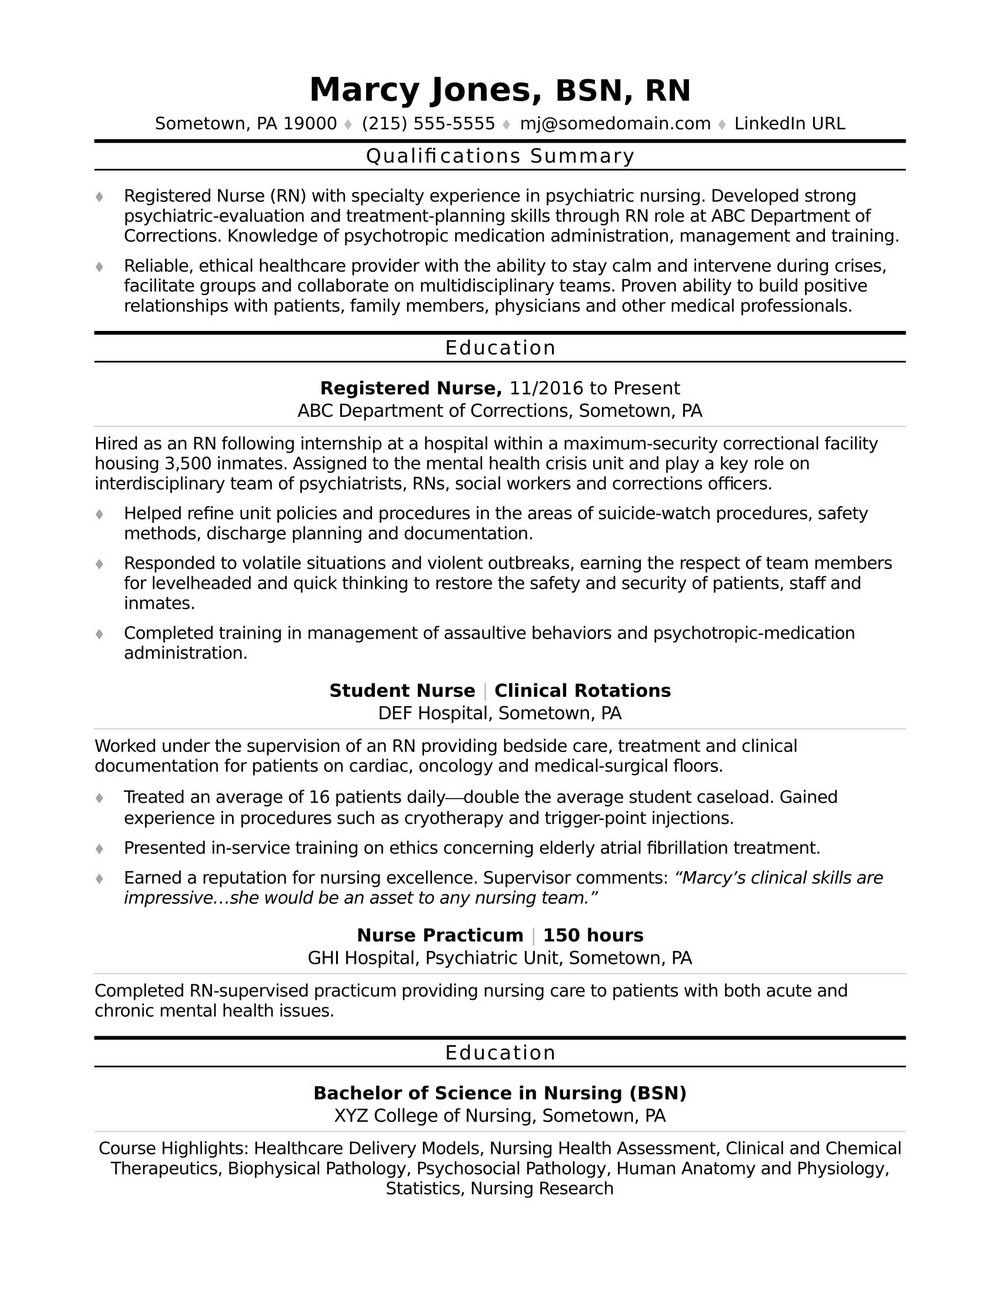 Nursing Student Resume For Rn Position